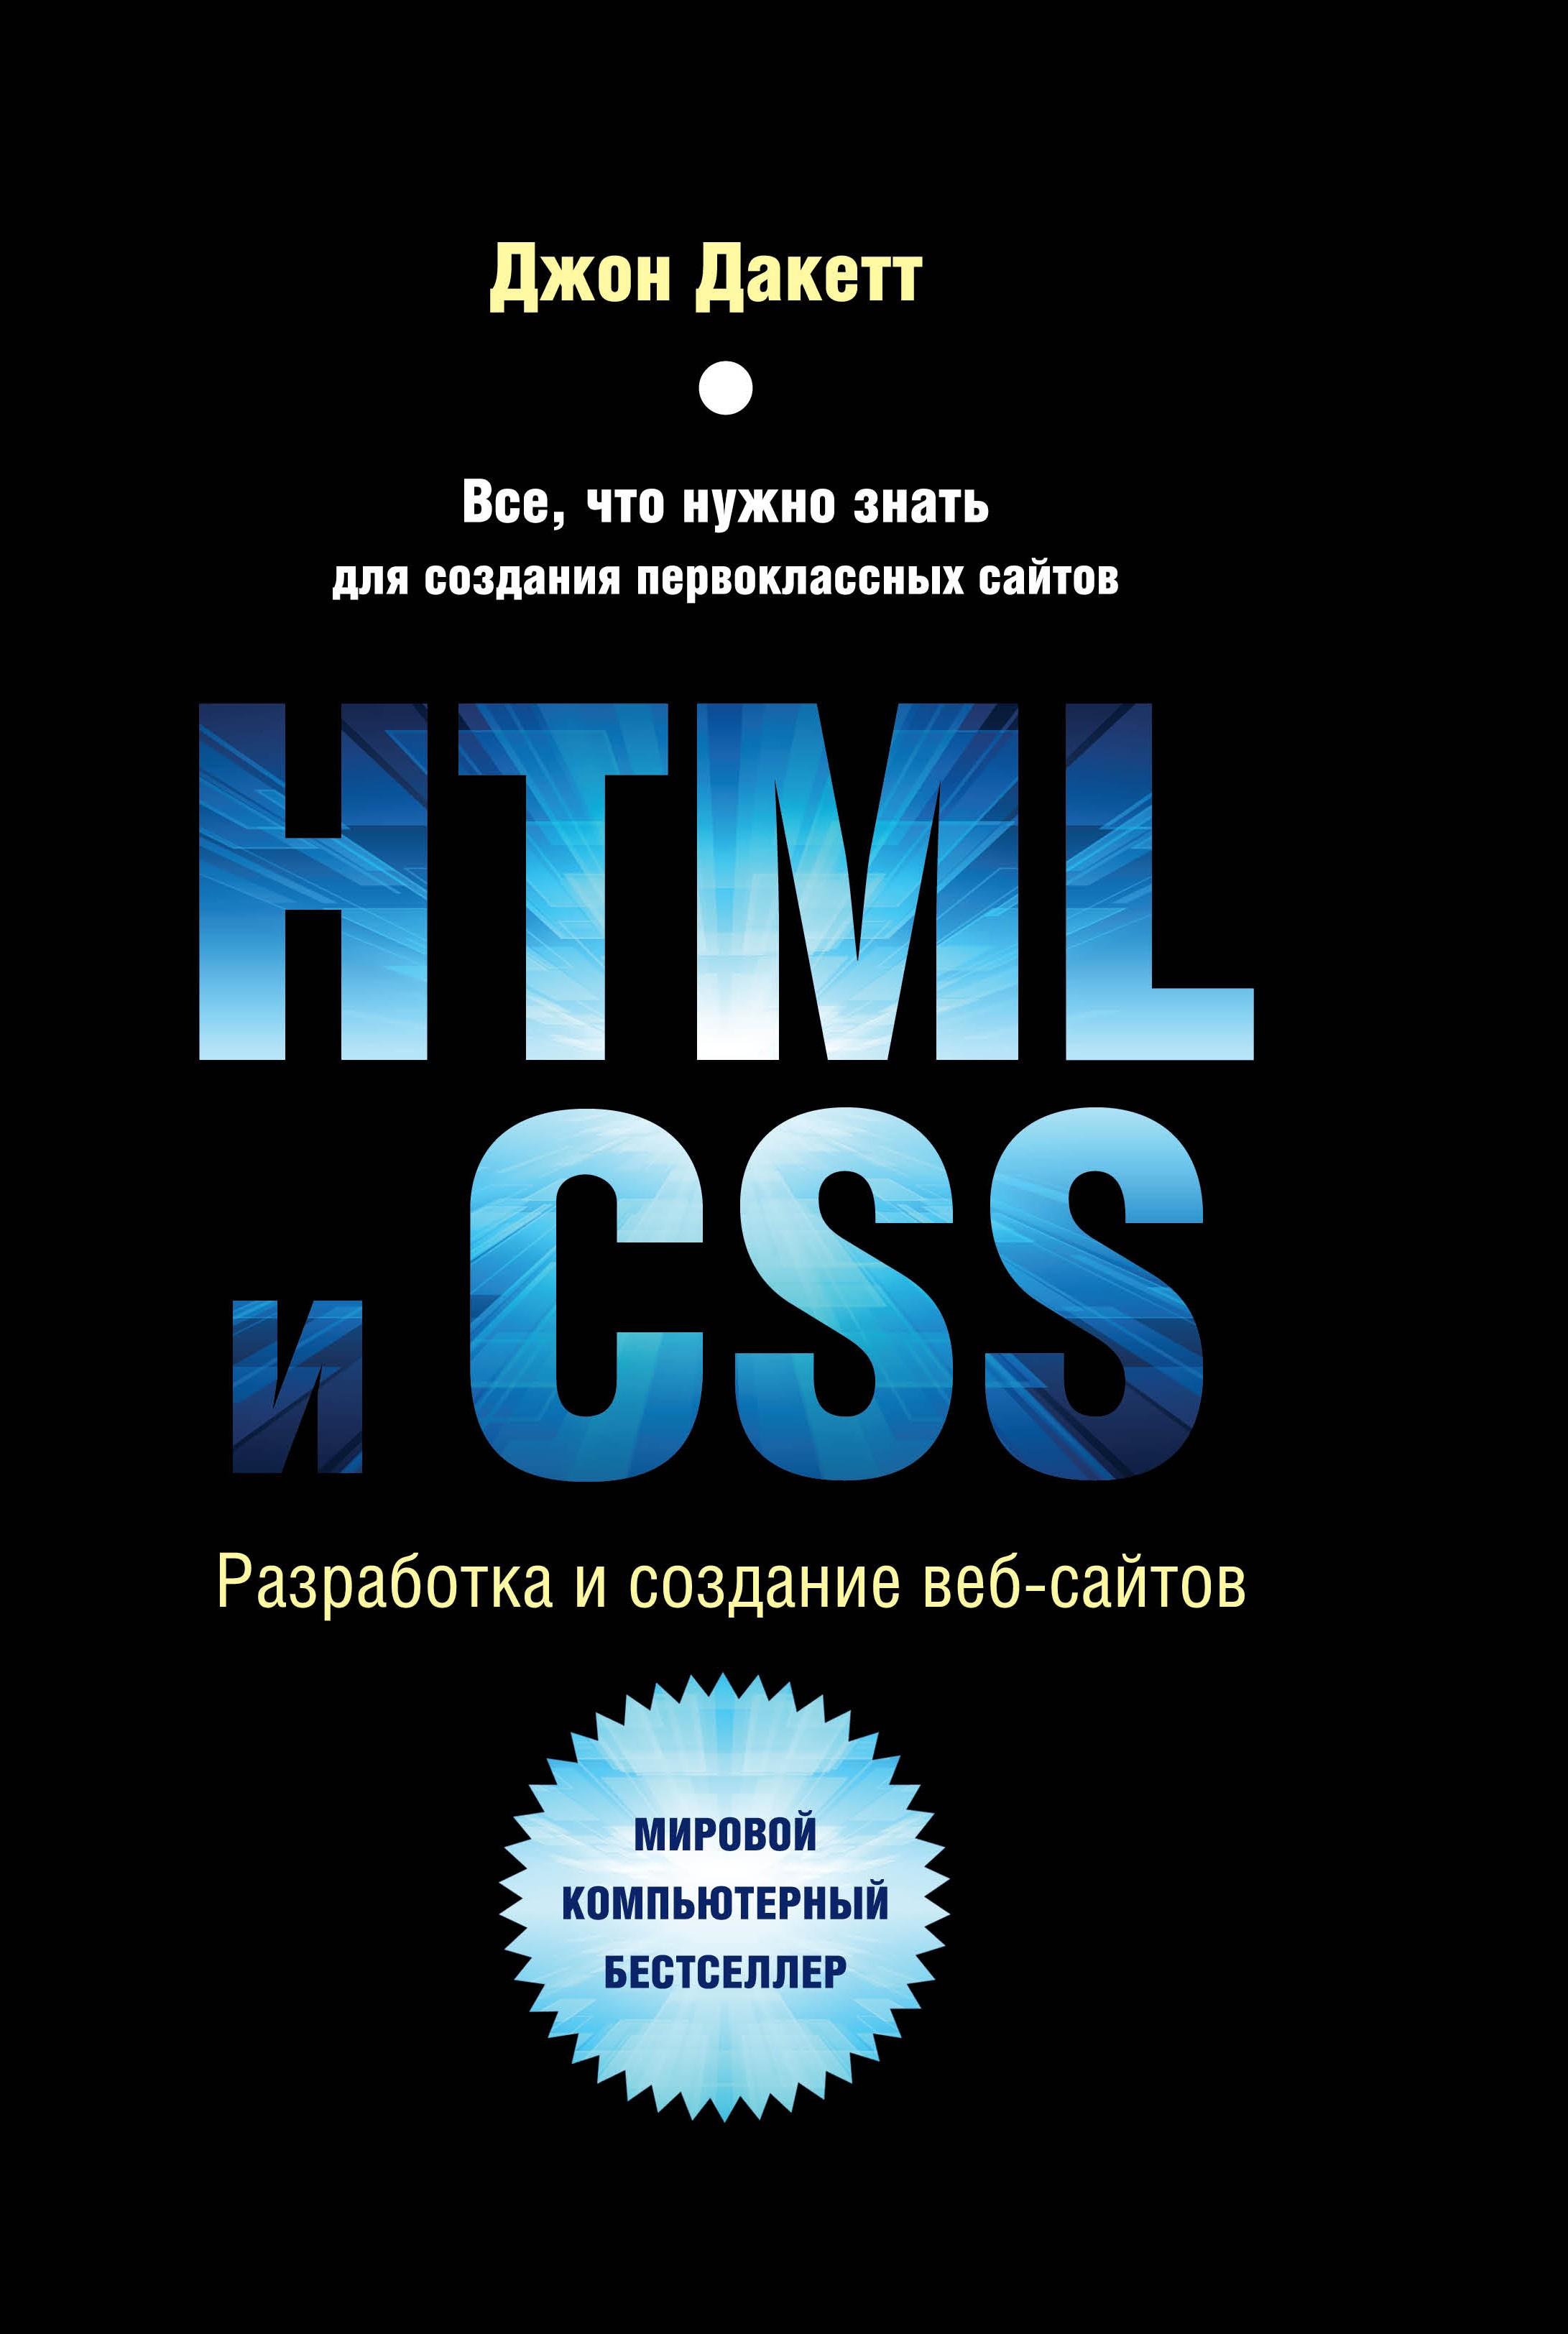 Джон Дакетт HTML и CSS. Разработка и дизайн веб-сайтов дакетт джон html и css разработка и дизайн веб сайтов cd